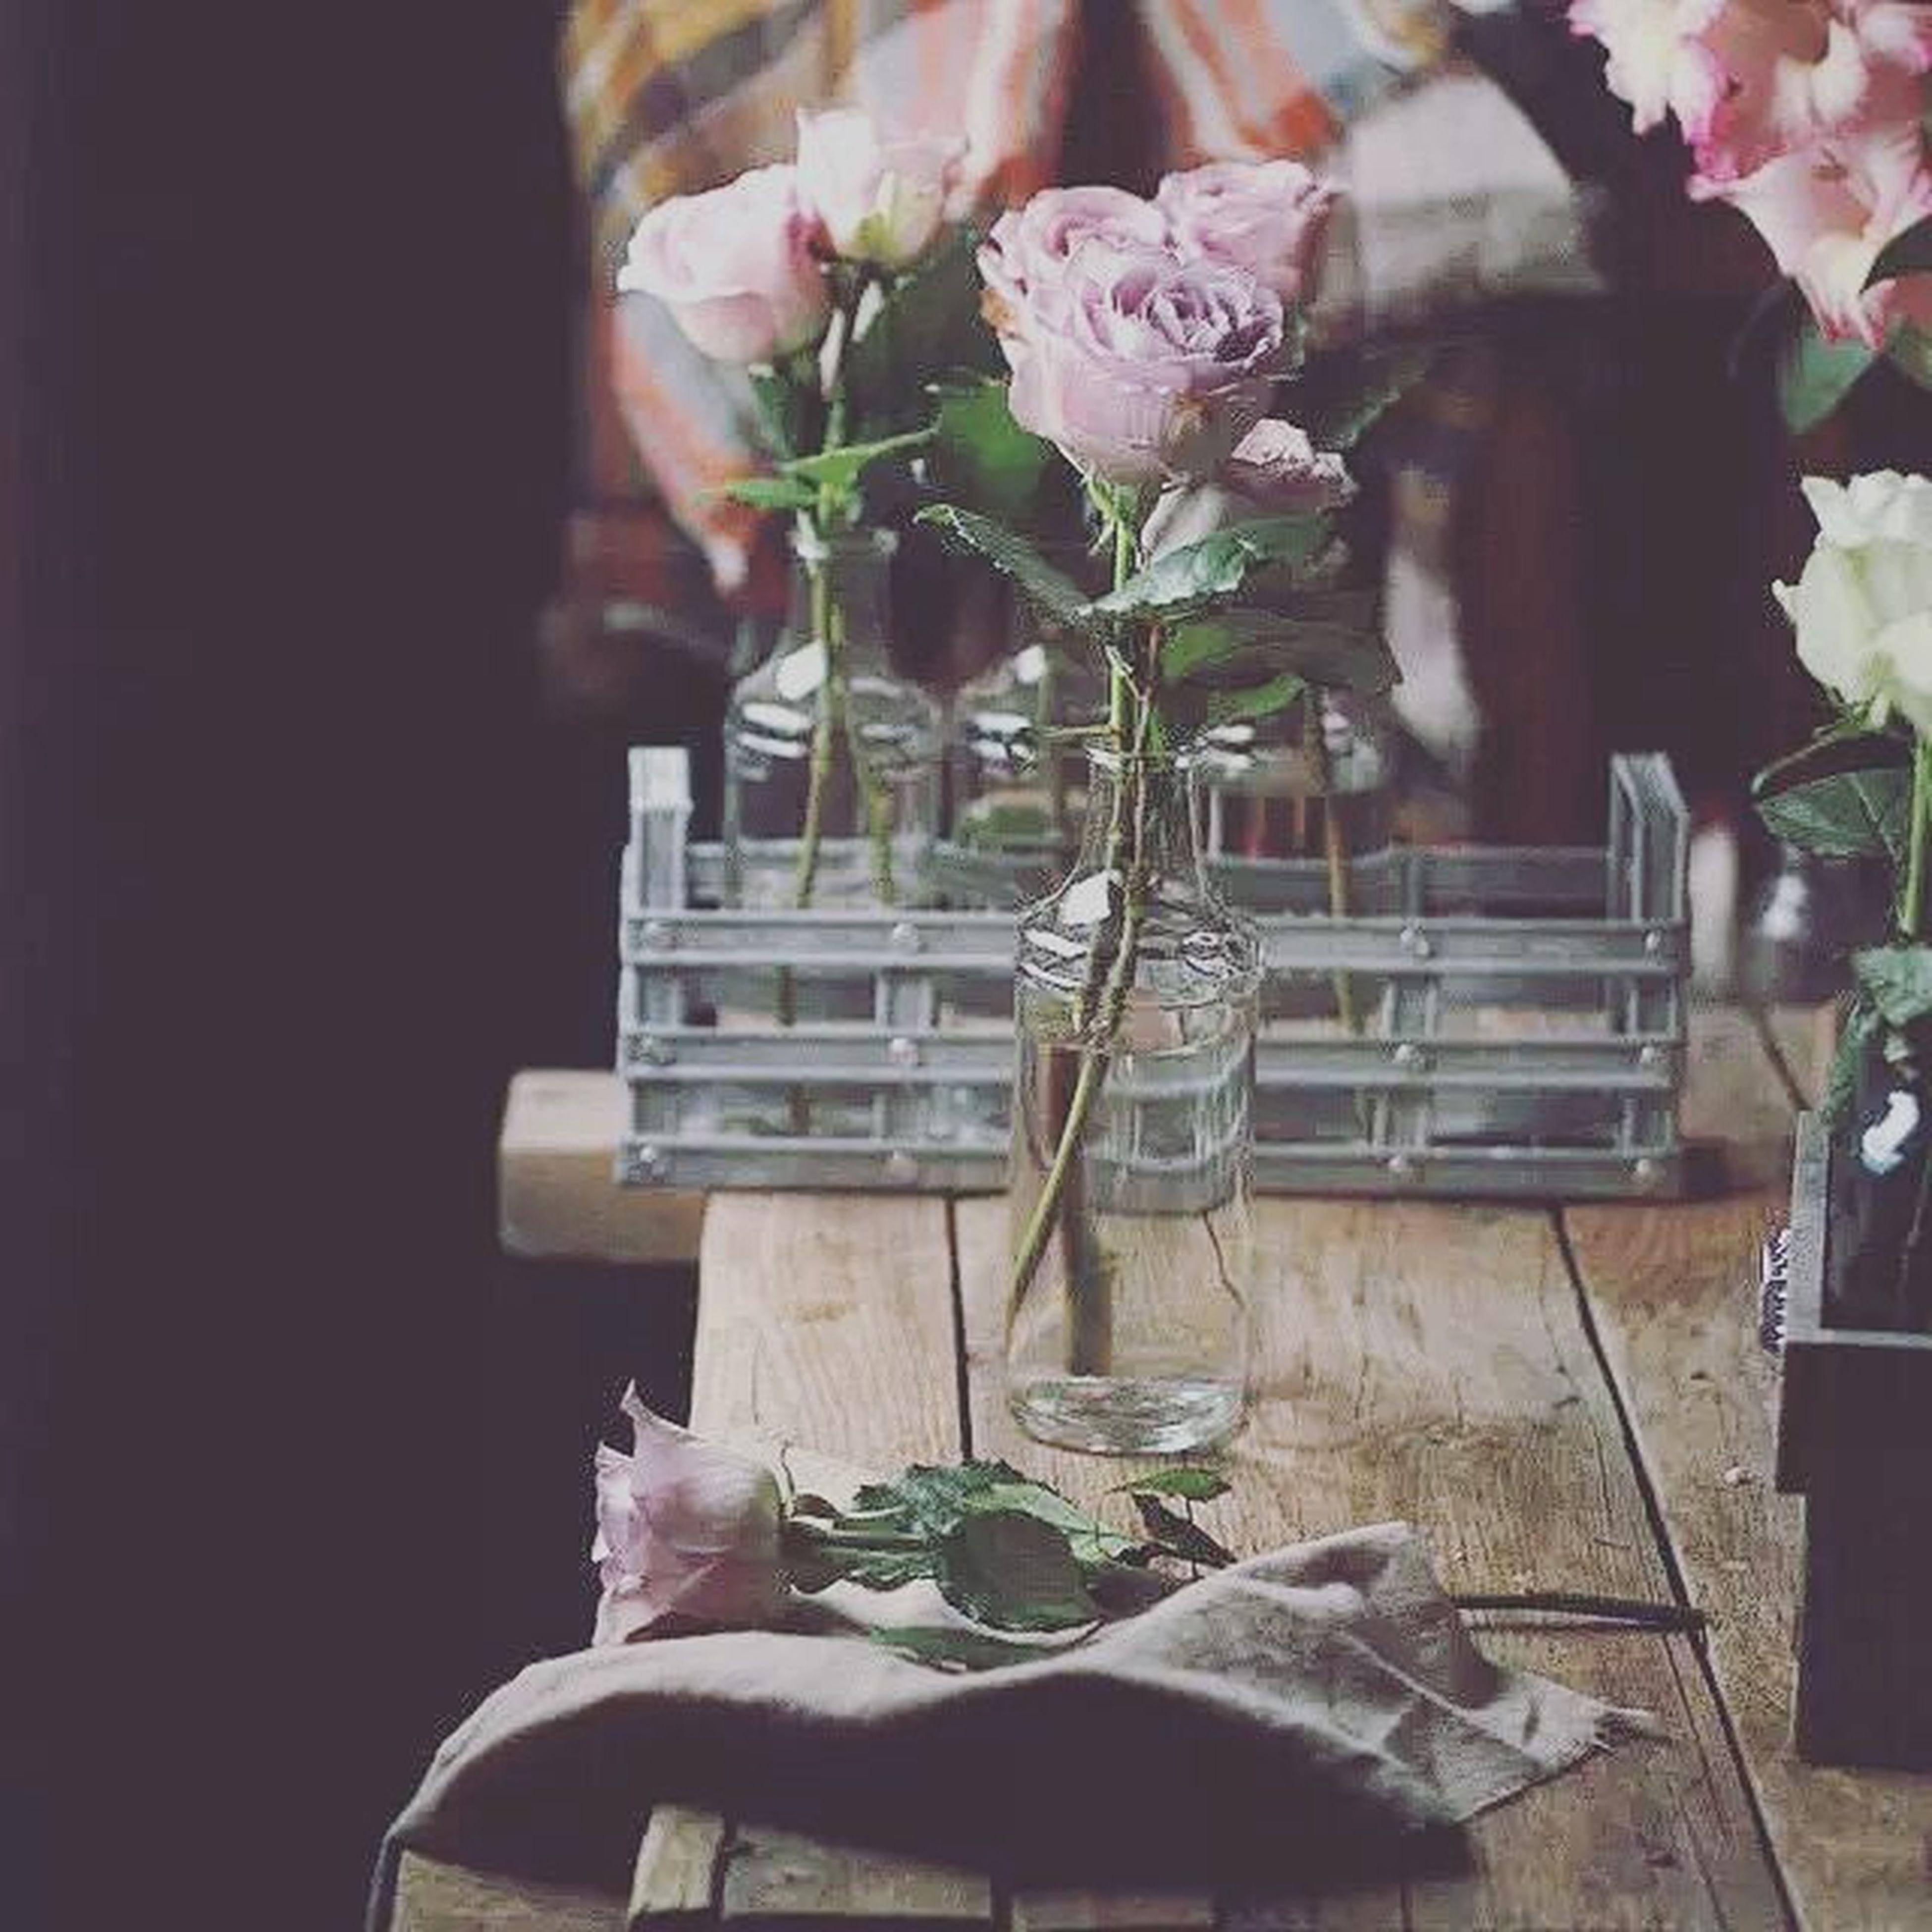 flower, indoors, vase, table, potted plant, freshness, fragility, home interior, plant, petal, growth, chair, flower arrangement, decoration, flower pot, no people, still life, nature, flower head, close-up